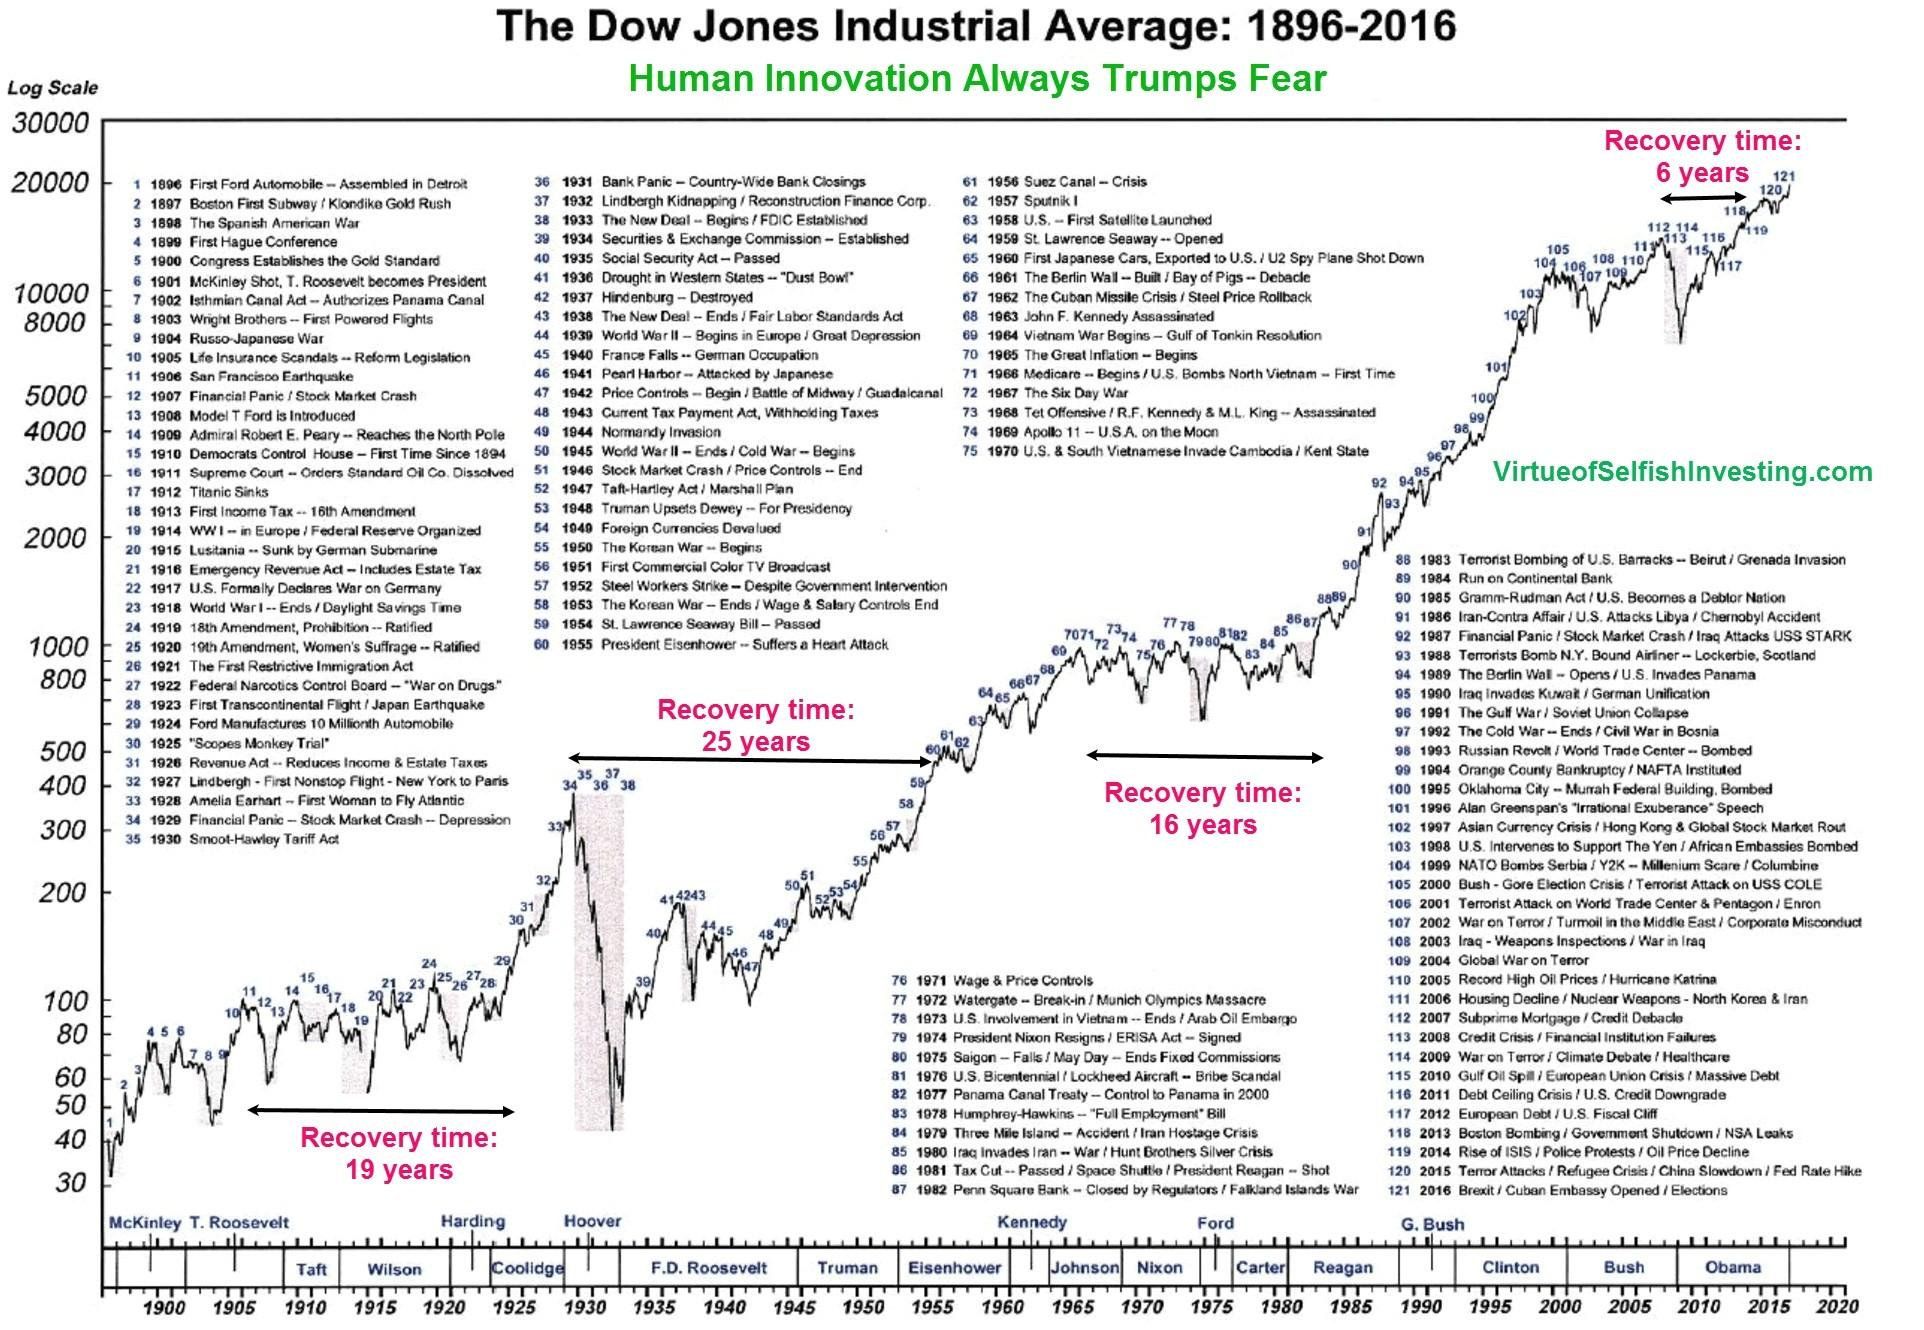 The Dow Jones Industrial Average 1896-2016 - Skloff Financial Group